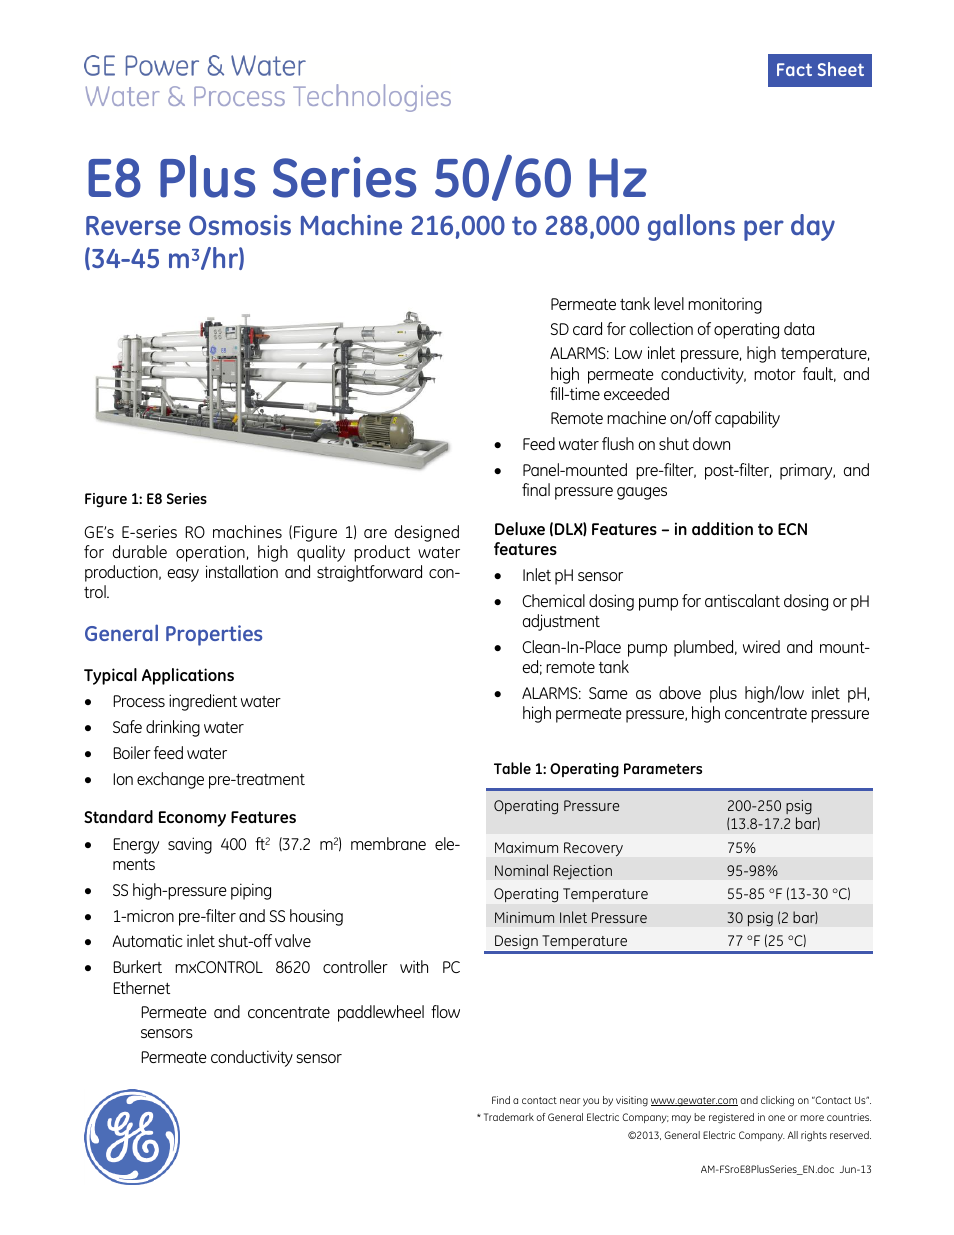 Ge P W E Series Reverse Osmosis E8 Plus Series 50 60 Hz User